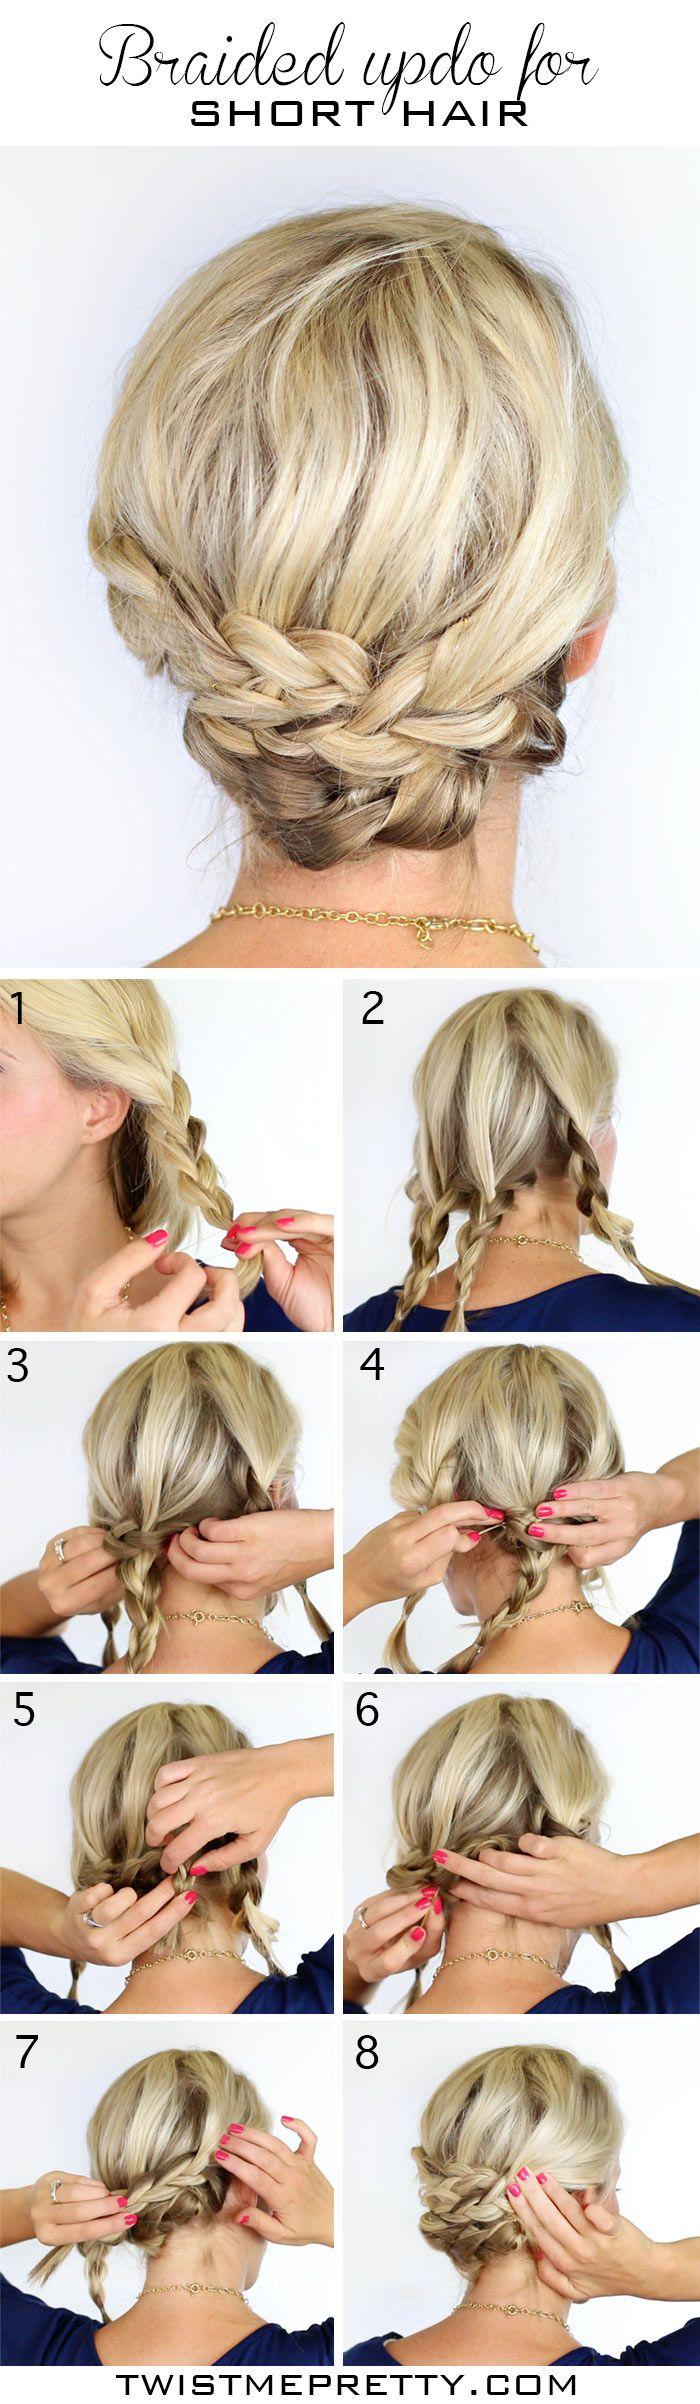 Outstanding 1000 Ideas About Braid Short Hair On Pinterest Highlighted Hair Short Hairstyles Gunalazisus